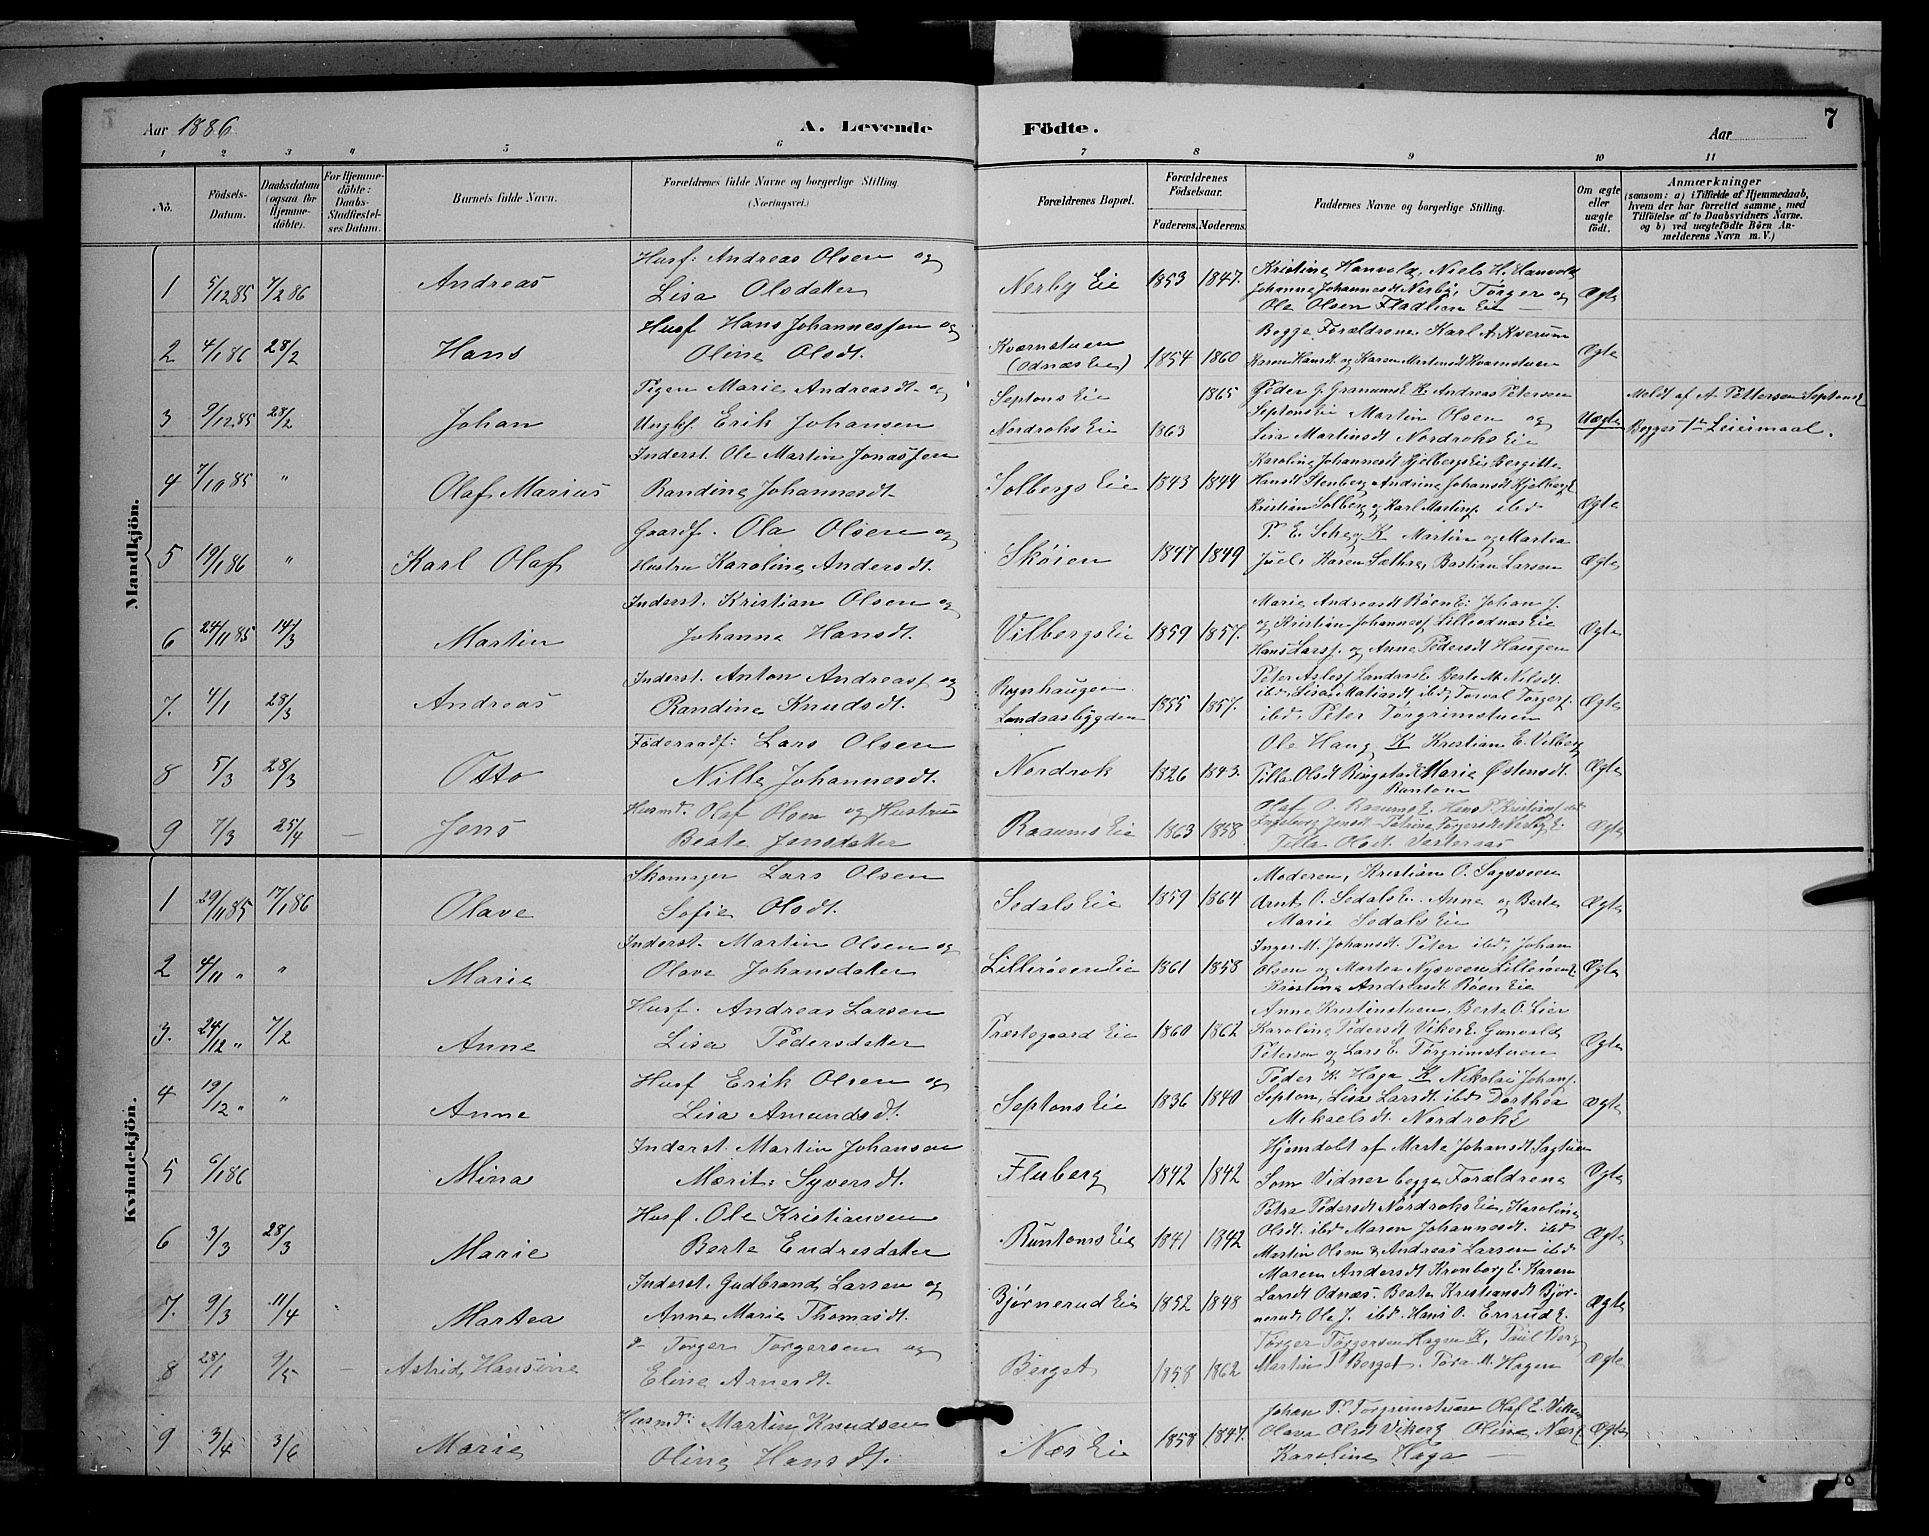 SAH, Søndre Land prestekontor, L/L0003: Klokkerbok nr. 3, 1884-1902, s. 7